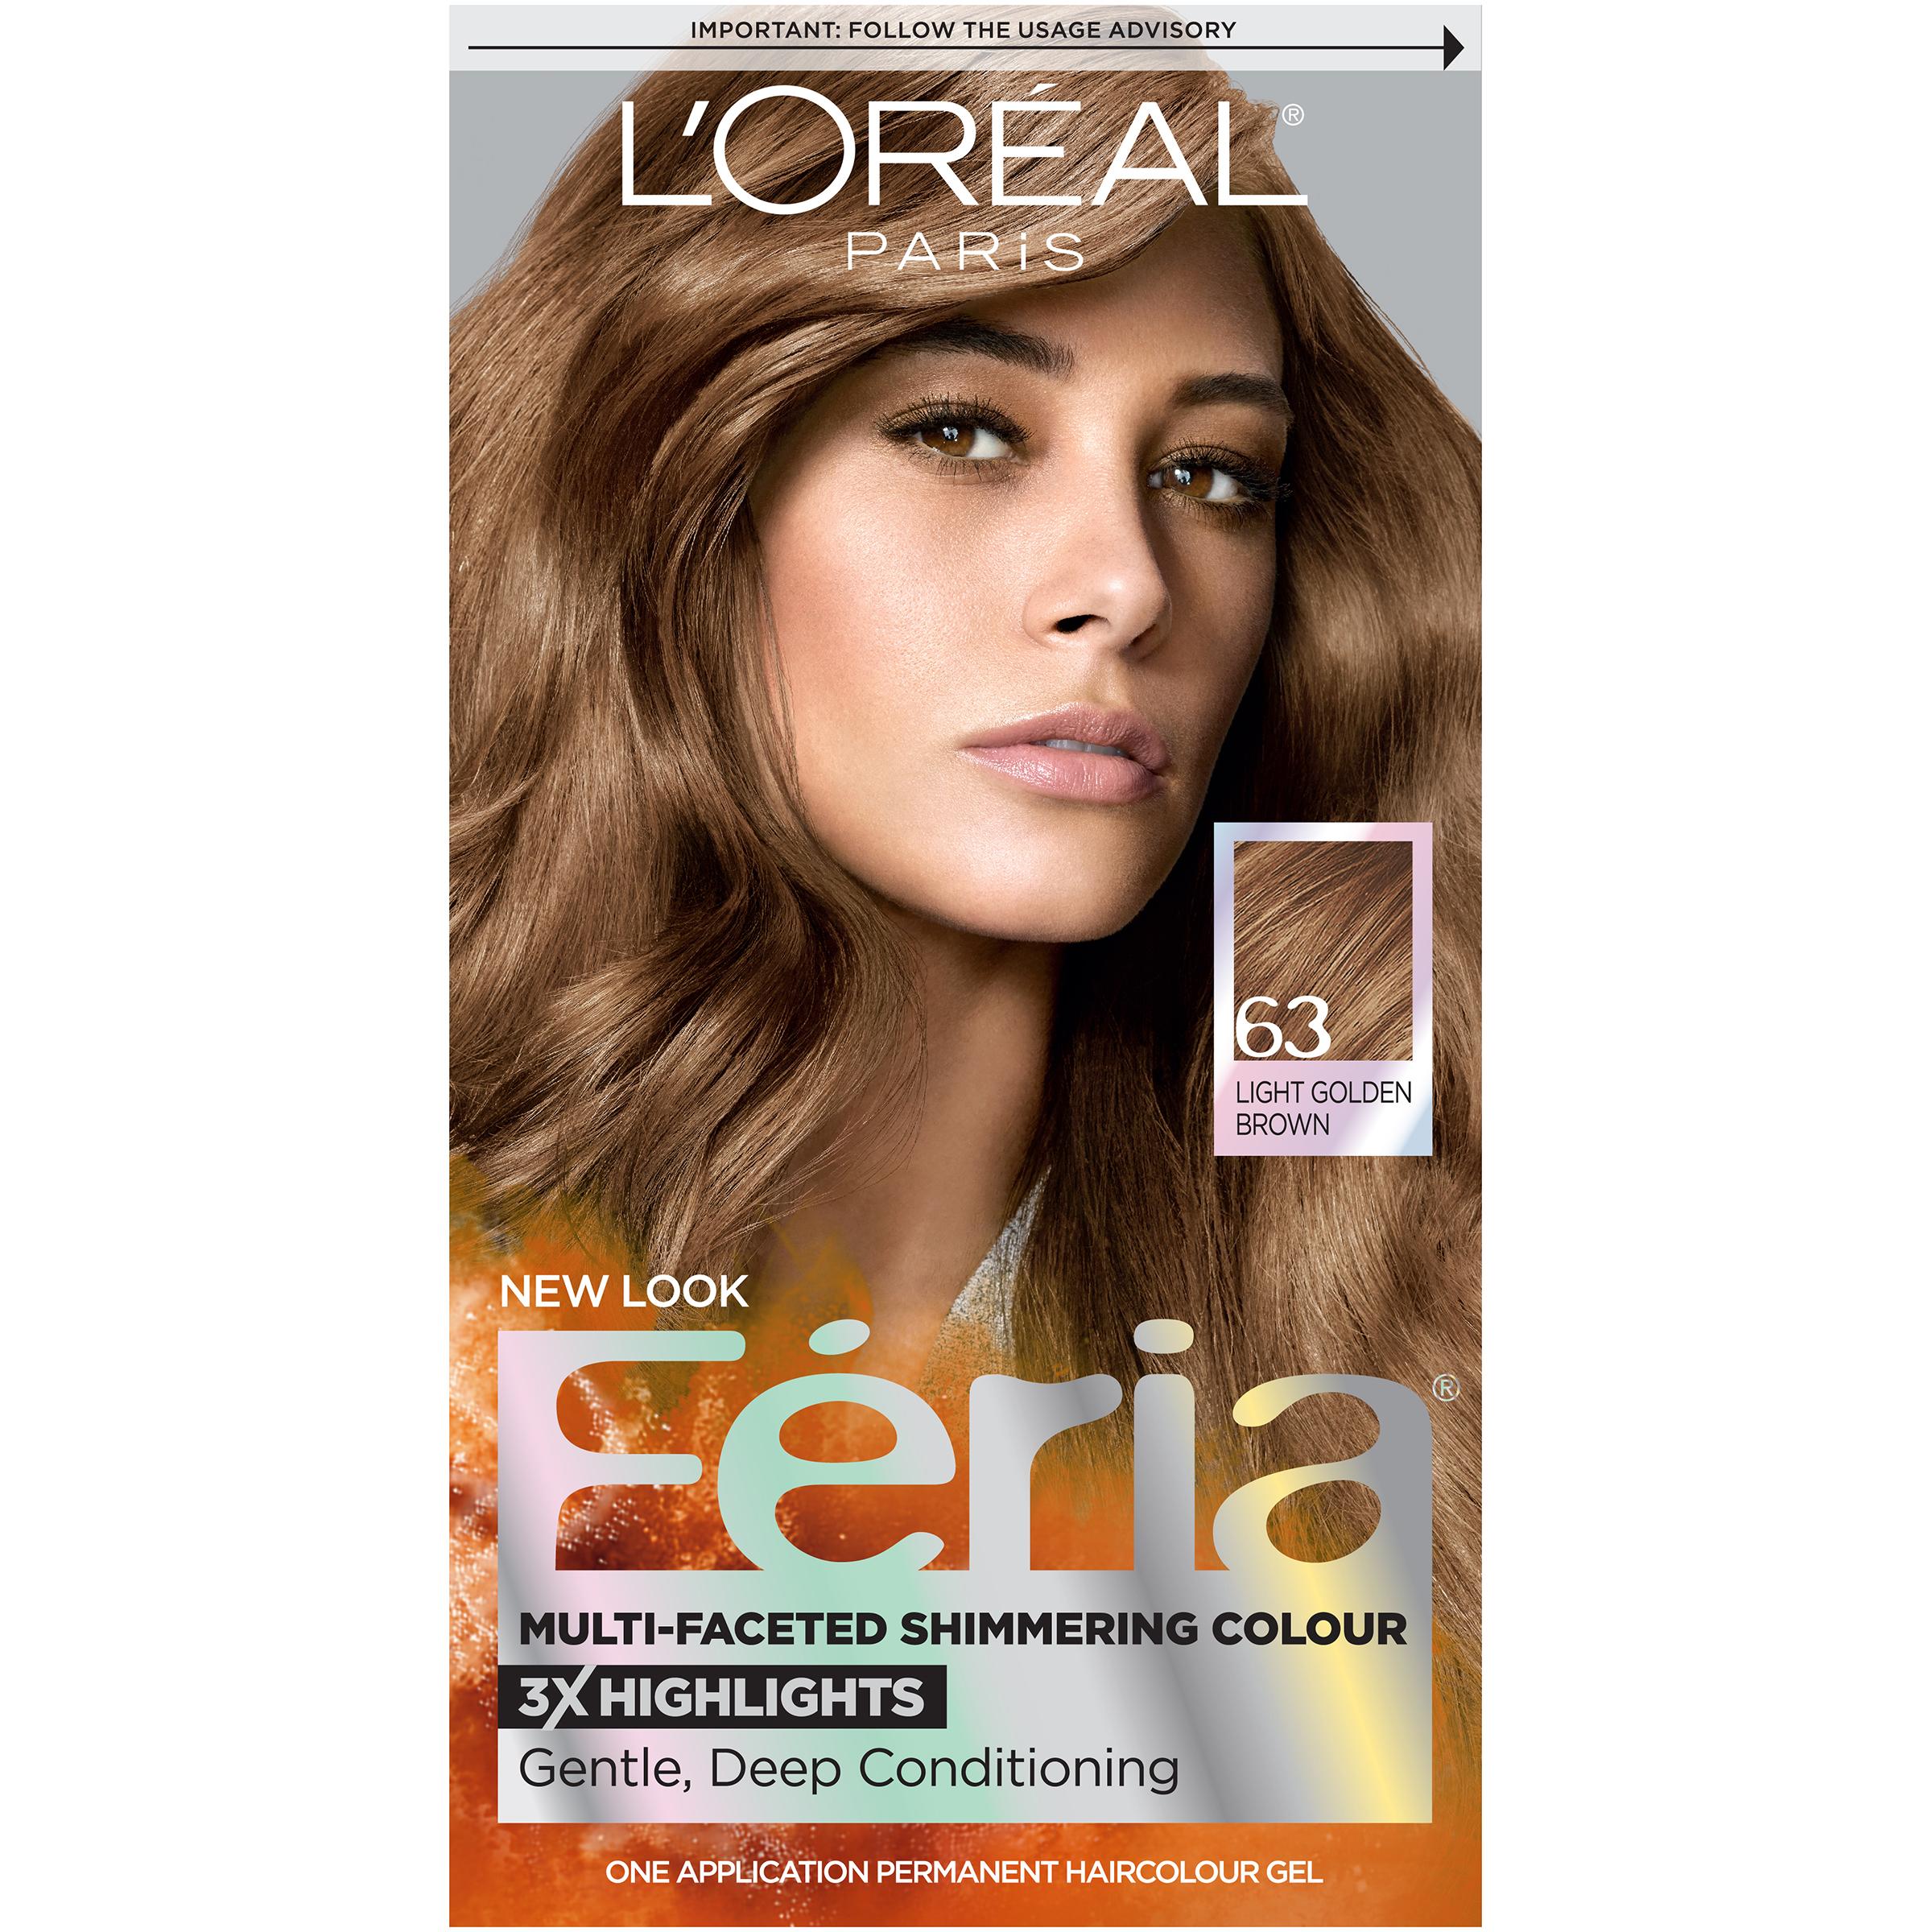 Loreal Paris Feria Shimmering Permanent Hair Color Polybull